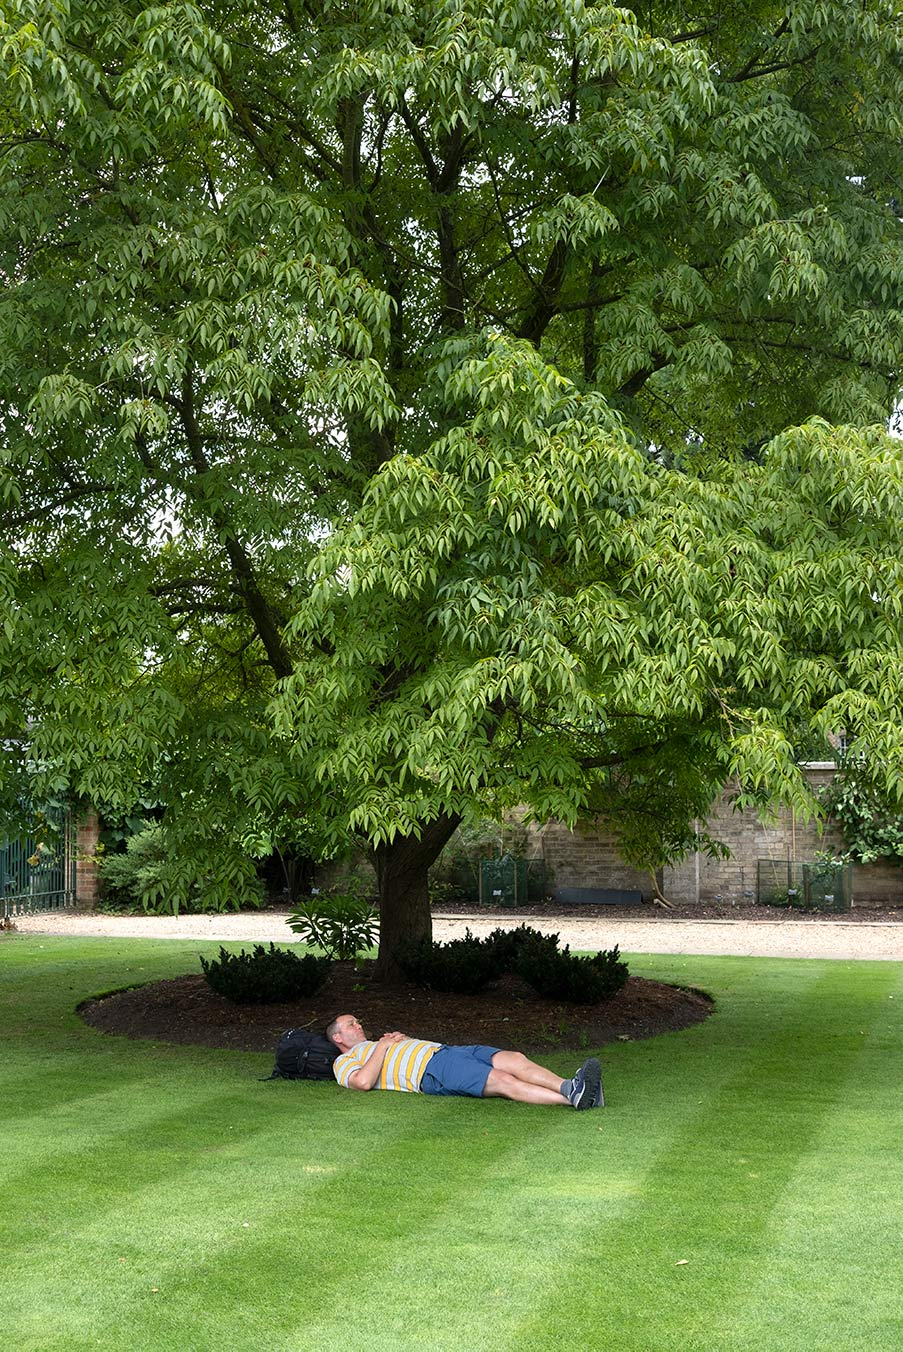 Platycarya strobilacea Juglandaceae with man asleep on the lawn before it.